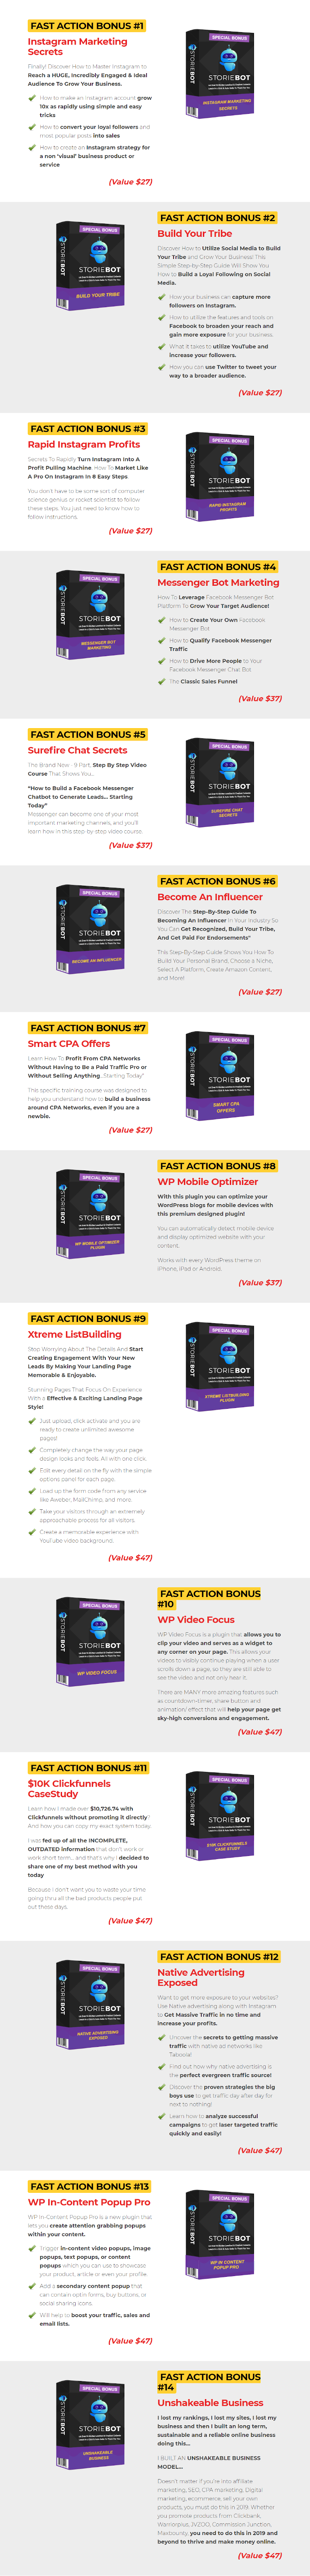 StorieBot Bonuses